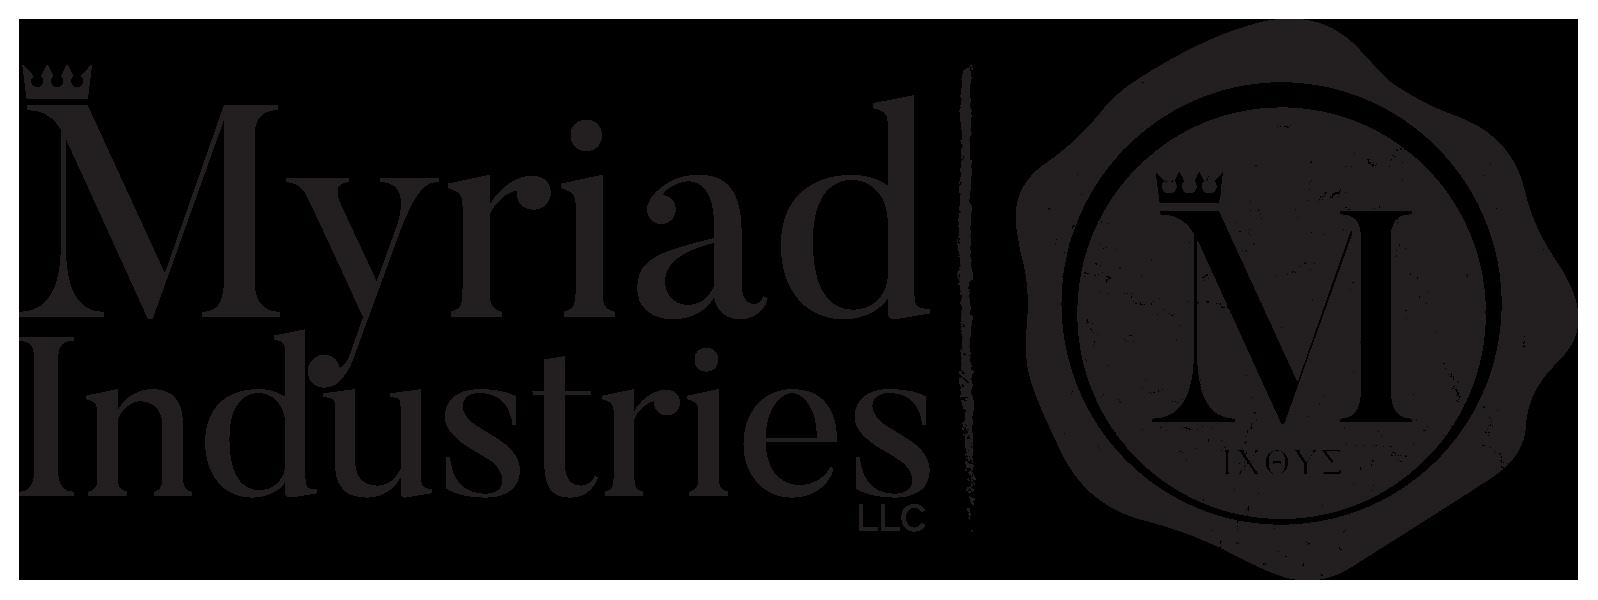 Myriadindustries logotype 06 final